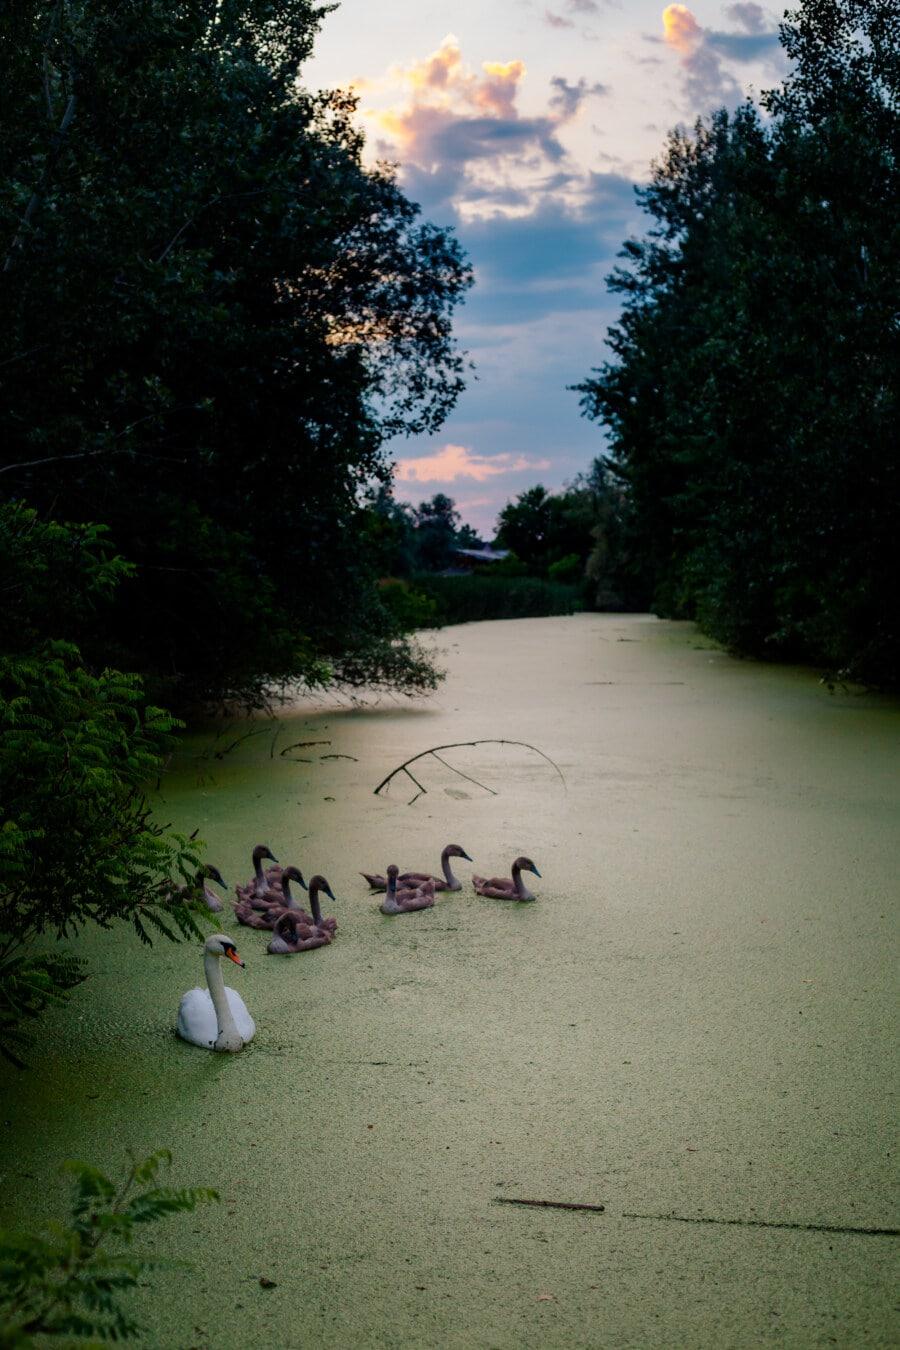 bird family, birds, flock, swan, swimmer, youngster, natural habitat, marshland, ecosystem, aquatic plant